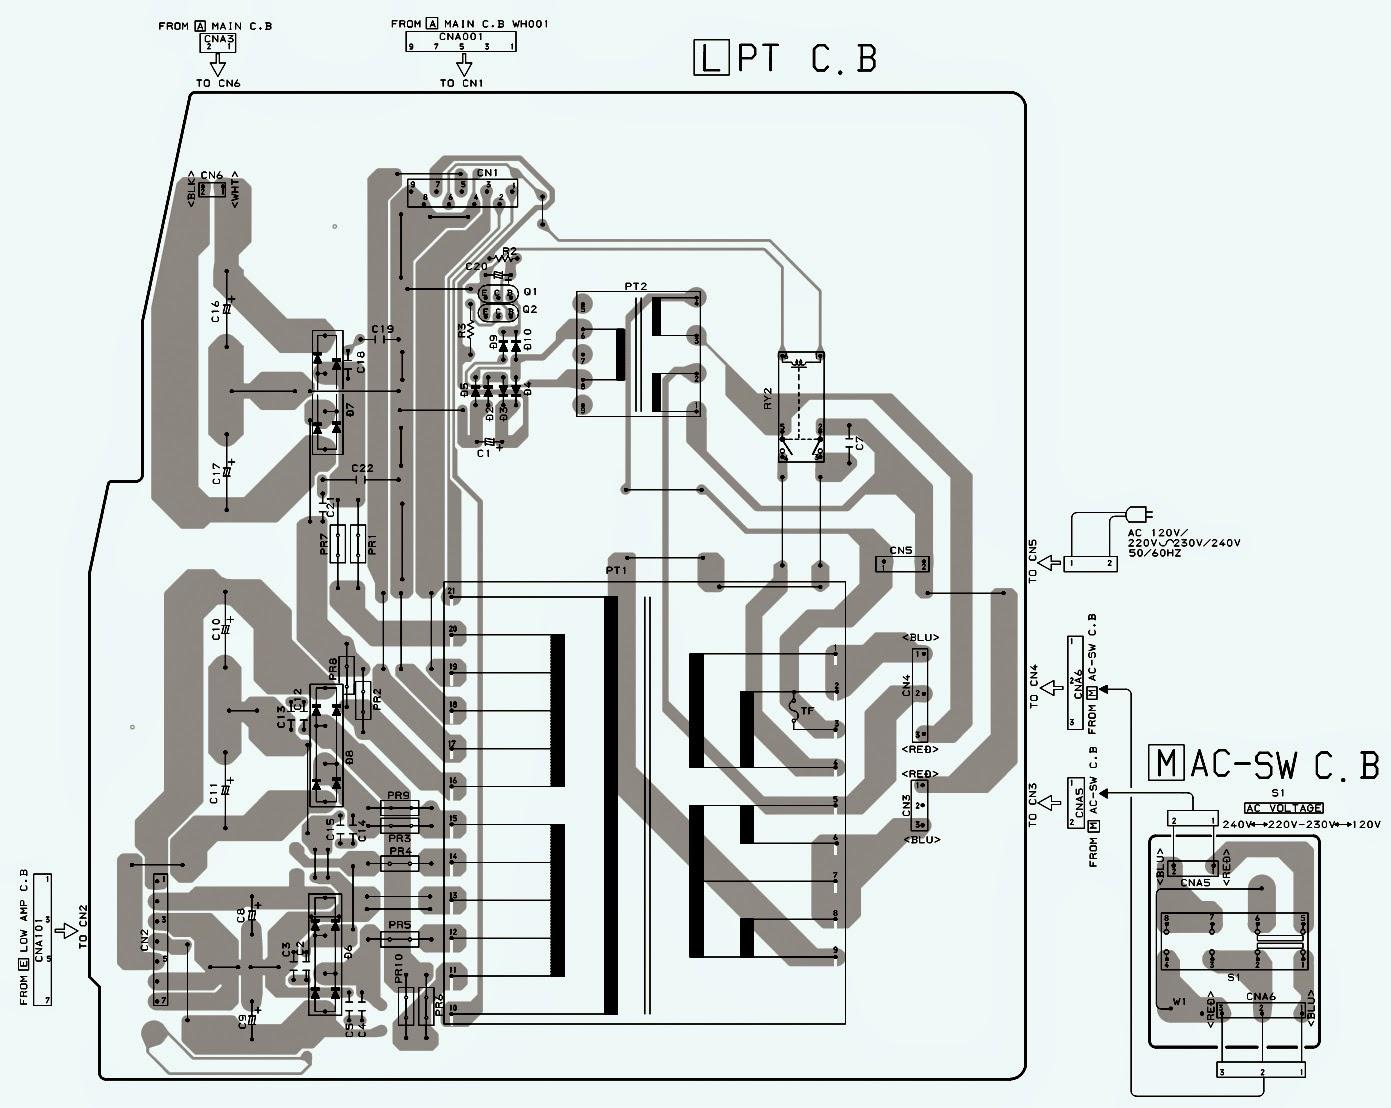 aiwa wiring diagram wiring diagram goaiwa stereo wiring harness diagram wiring diagram centre aiwa wiring diagram [ 1391 x 1108 Pixel ]